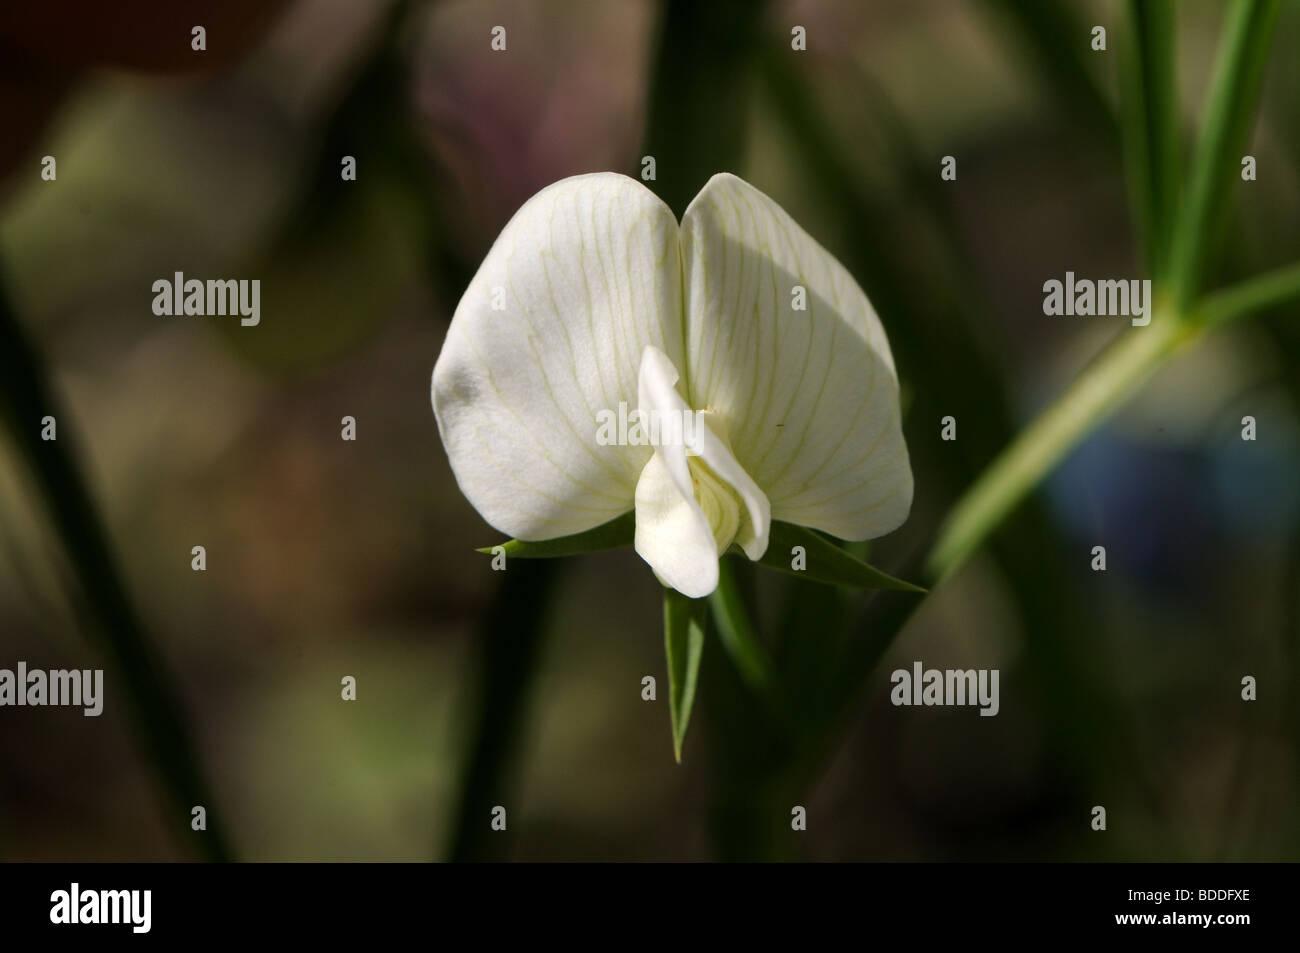 White Chickling pea flower (Lathyrus sativus var albus) - Stock Image